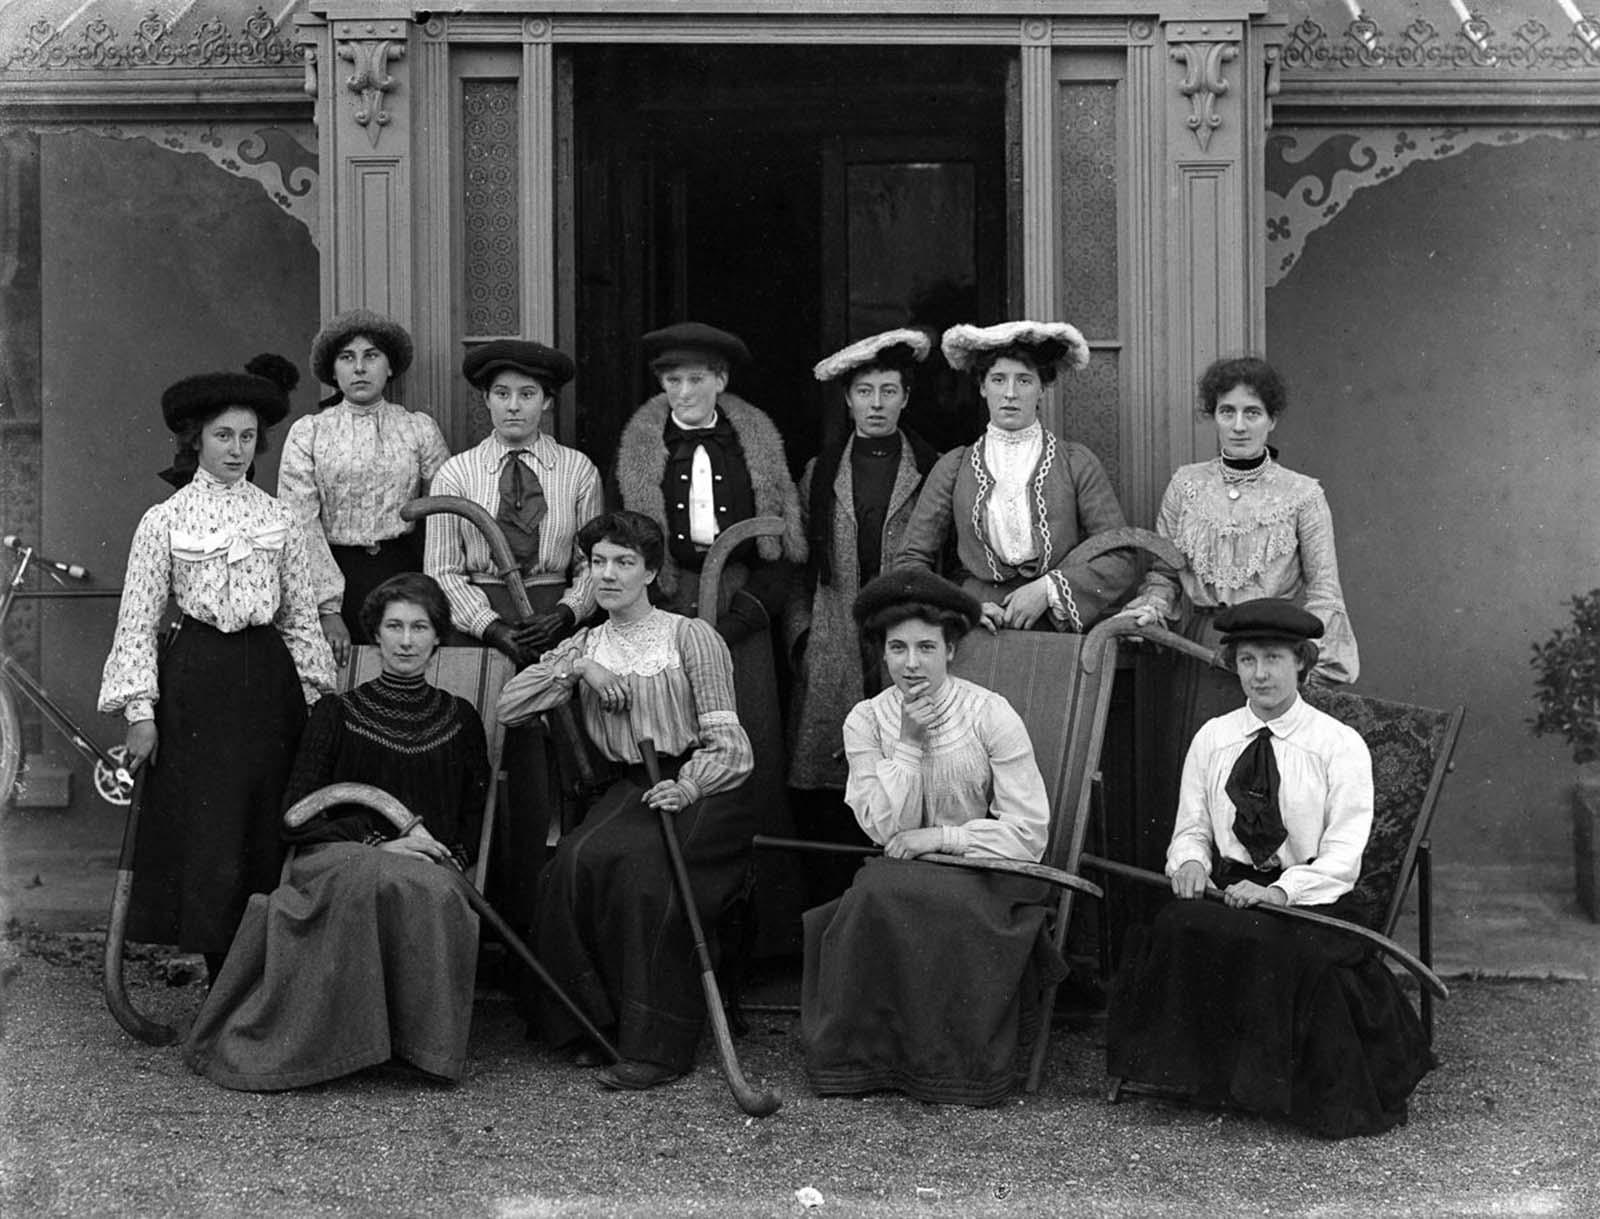 Field hockey players. 1904.